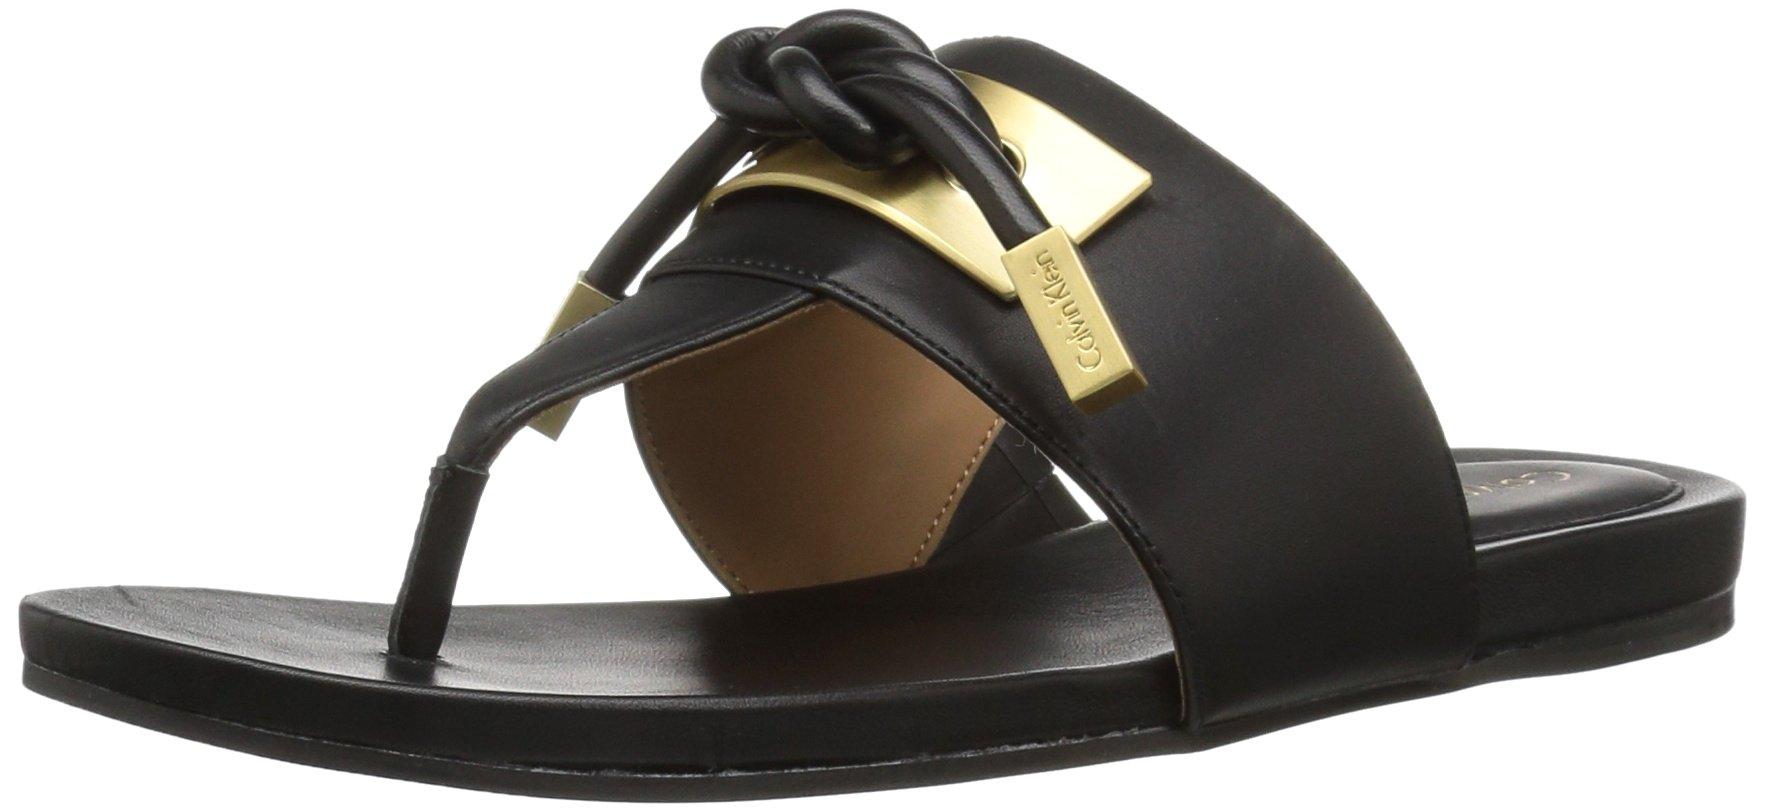 Calvin Klein Women's Parson Toe Ring Sandal, Black, 9 M US